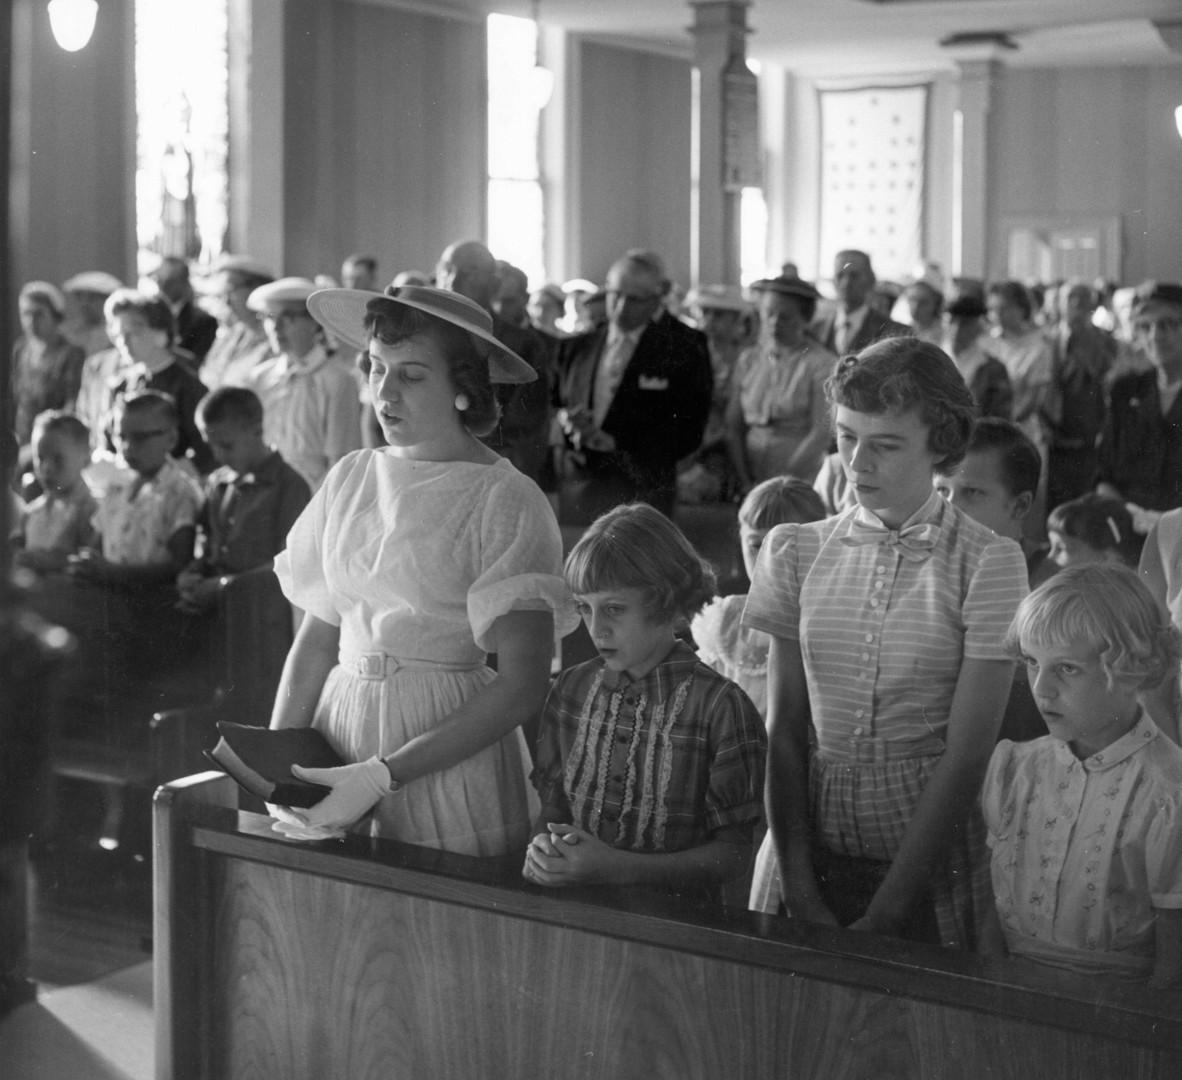 John Szarkowski, Immanuel Lutheran Church, Courtland, Minnesota, 1957